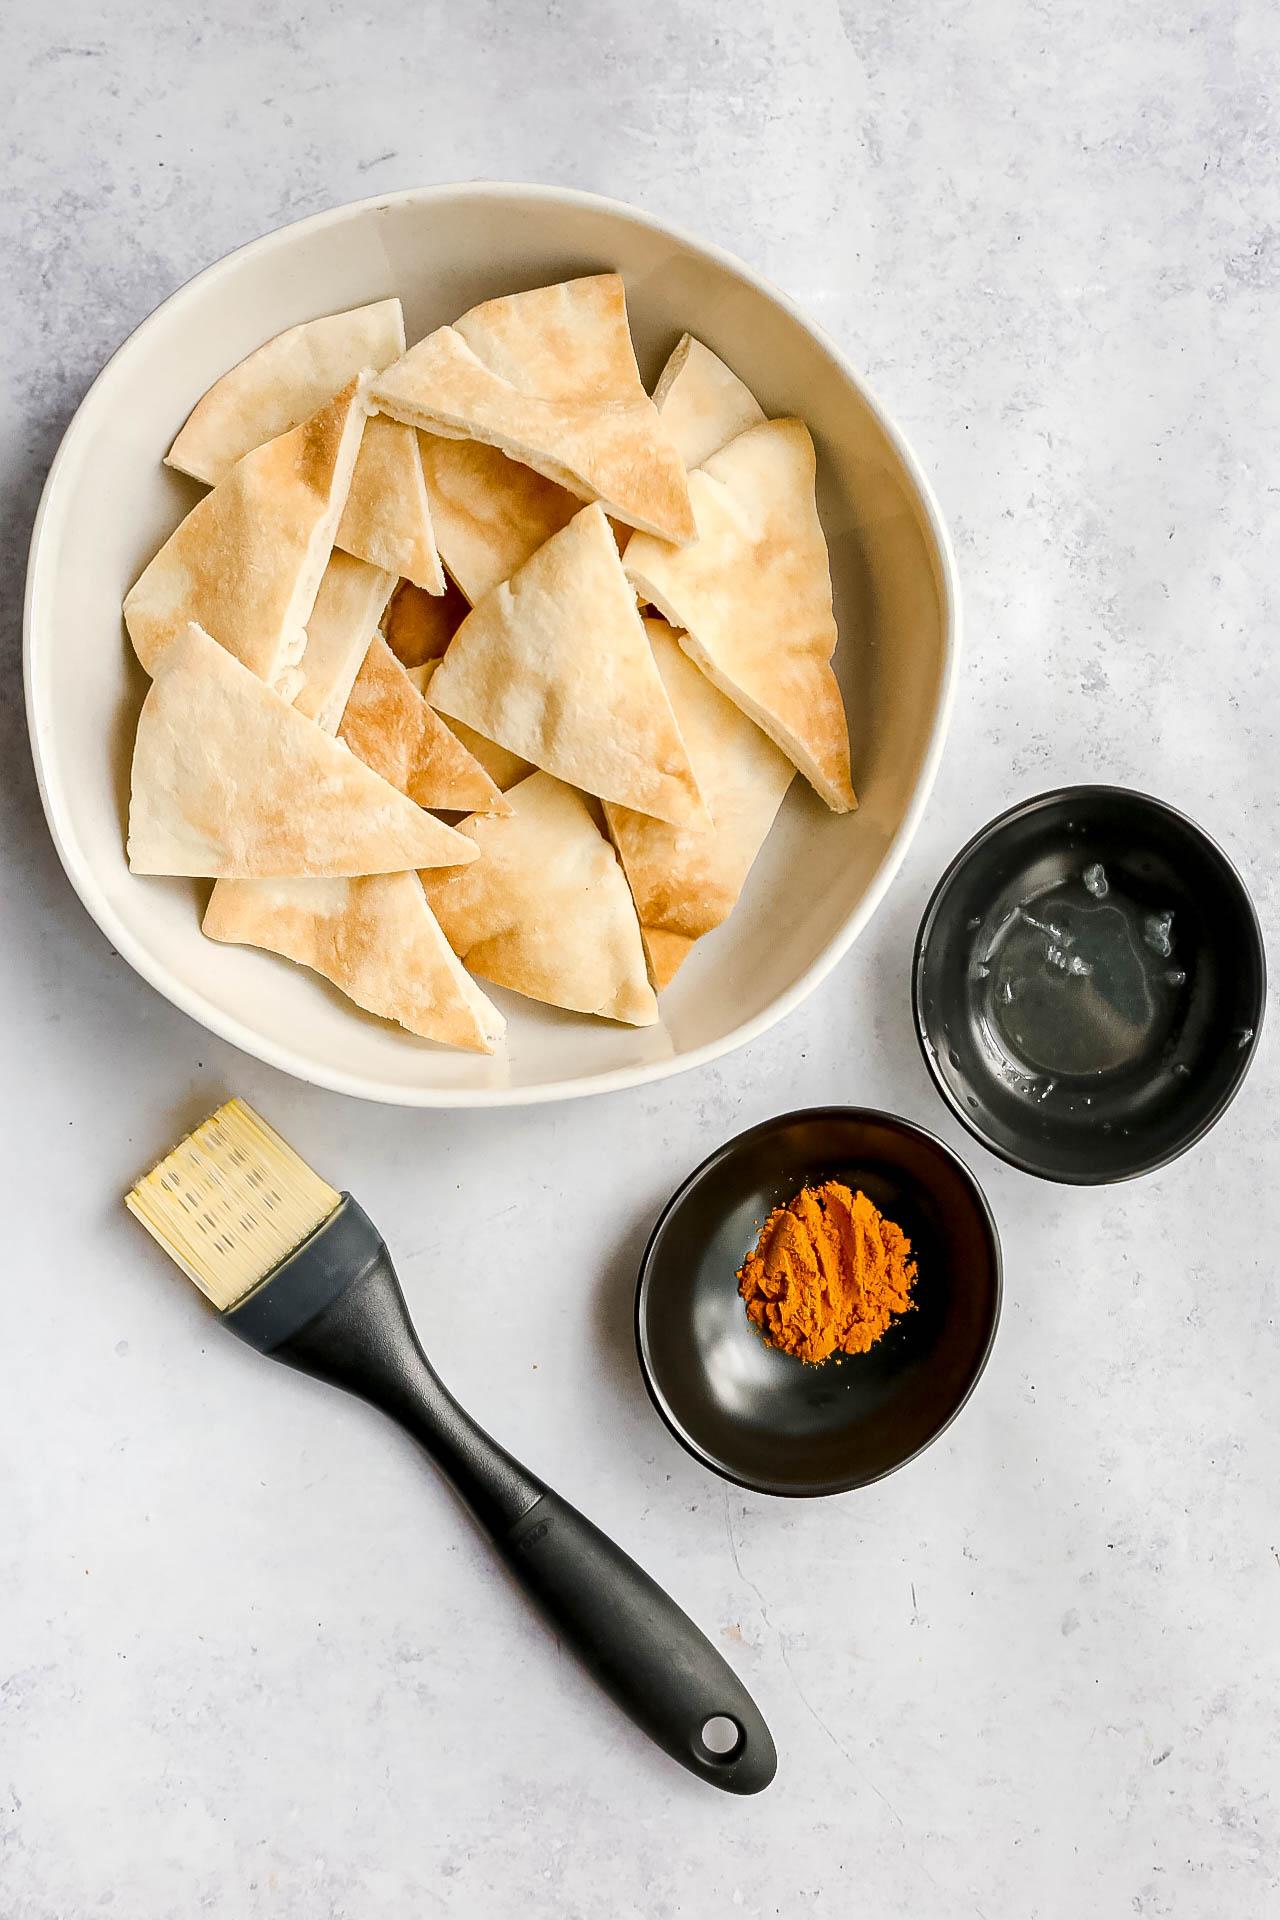 Curried Pita Chips Ingredients